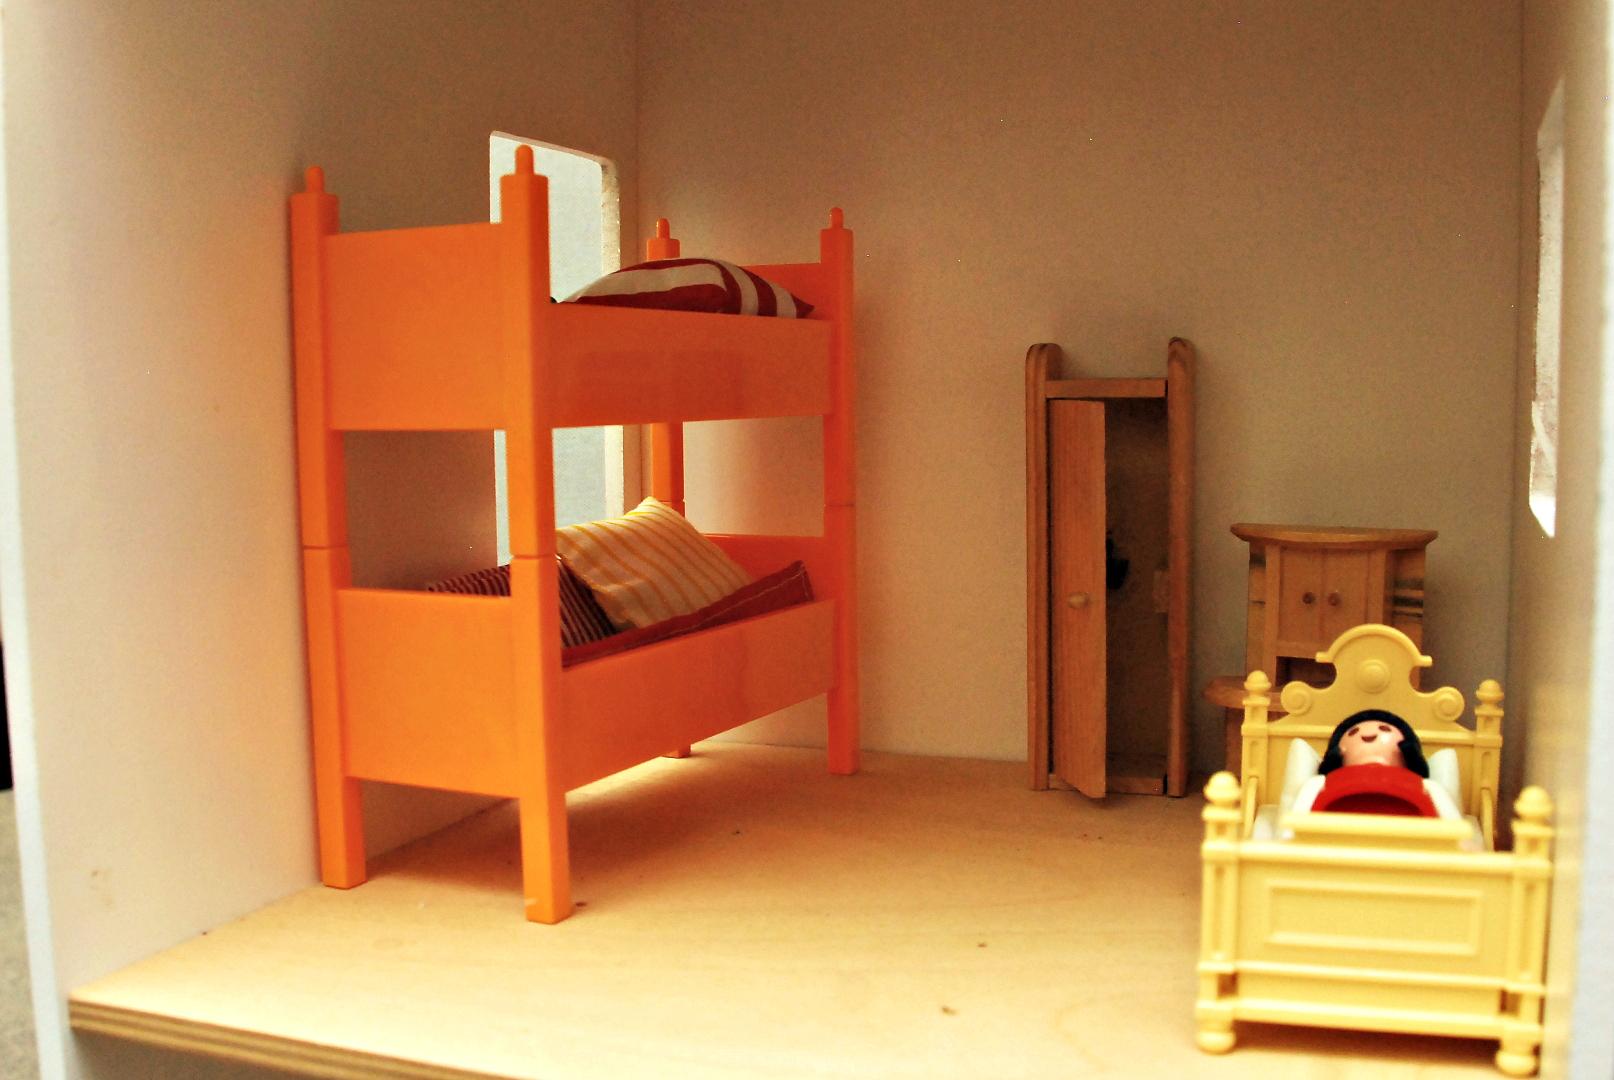 Toy House 3.JPG